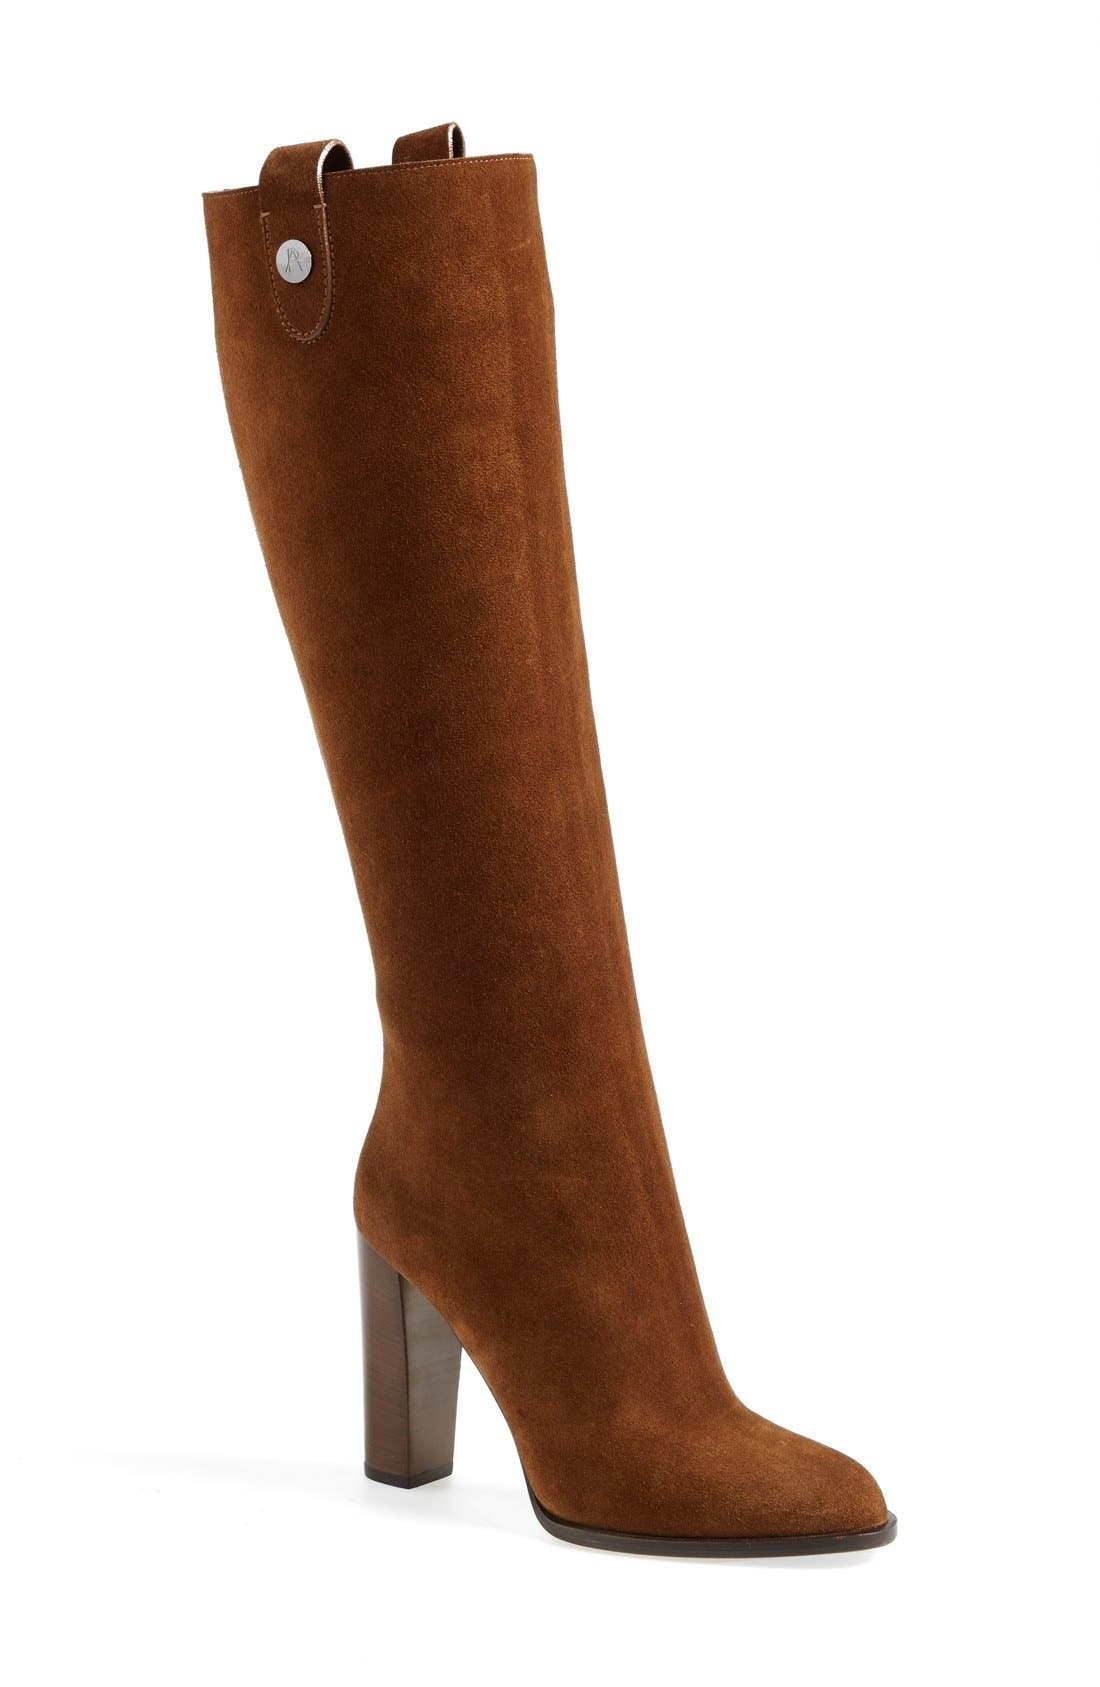 Alternate Image 1 Selected - Paul Andrew 'Osman' Knee High Boot (Women)